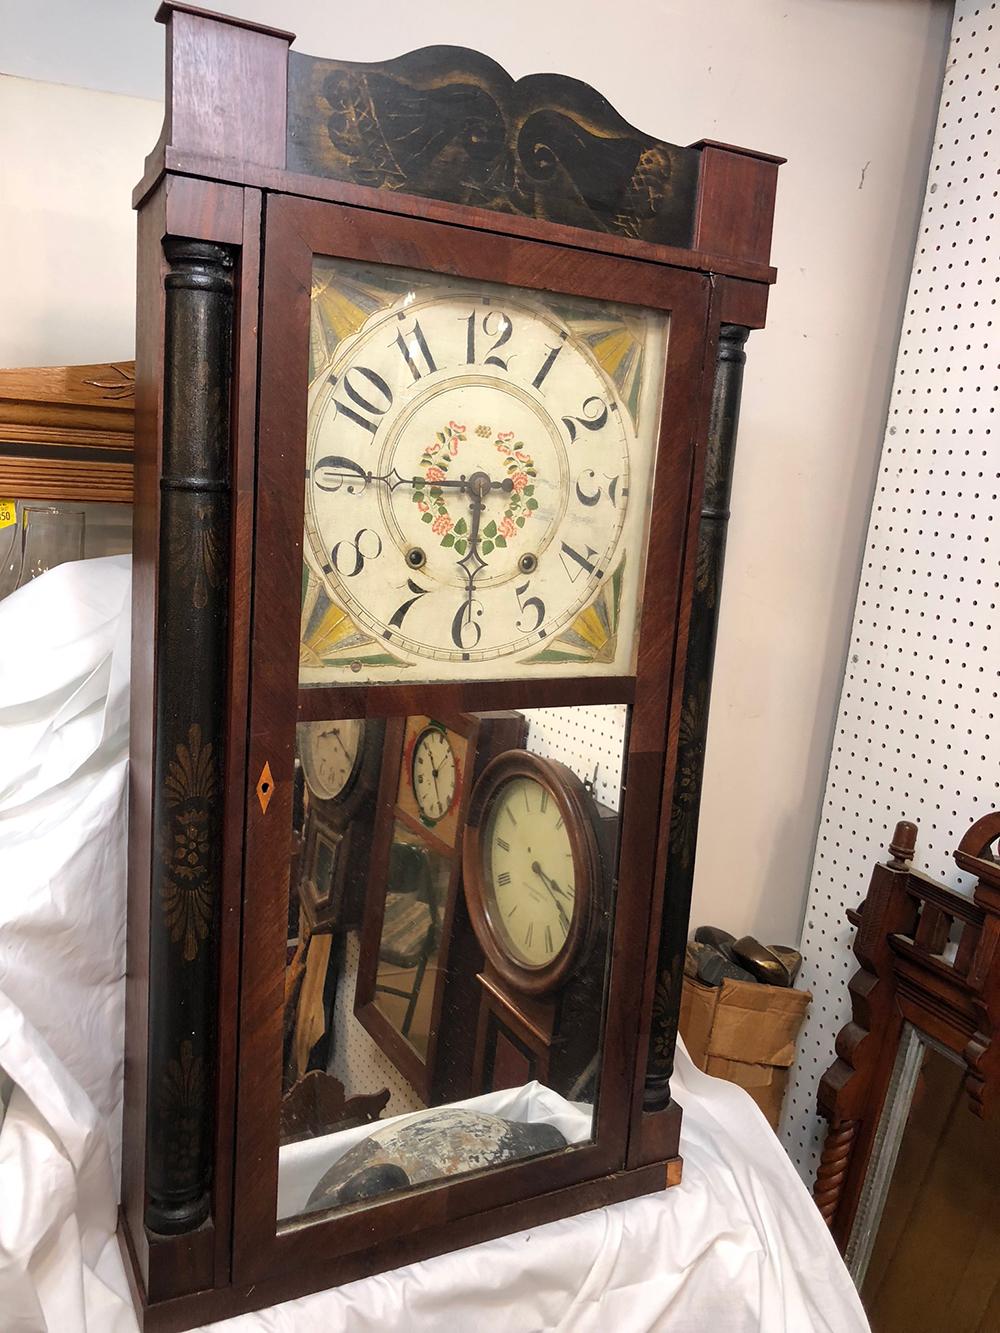 Roman M. Atler & Co. Antique Clock